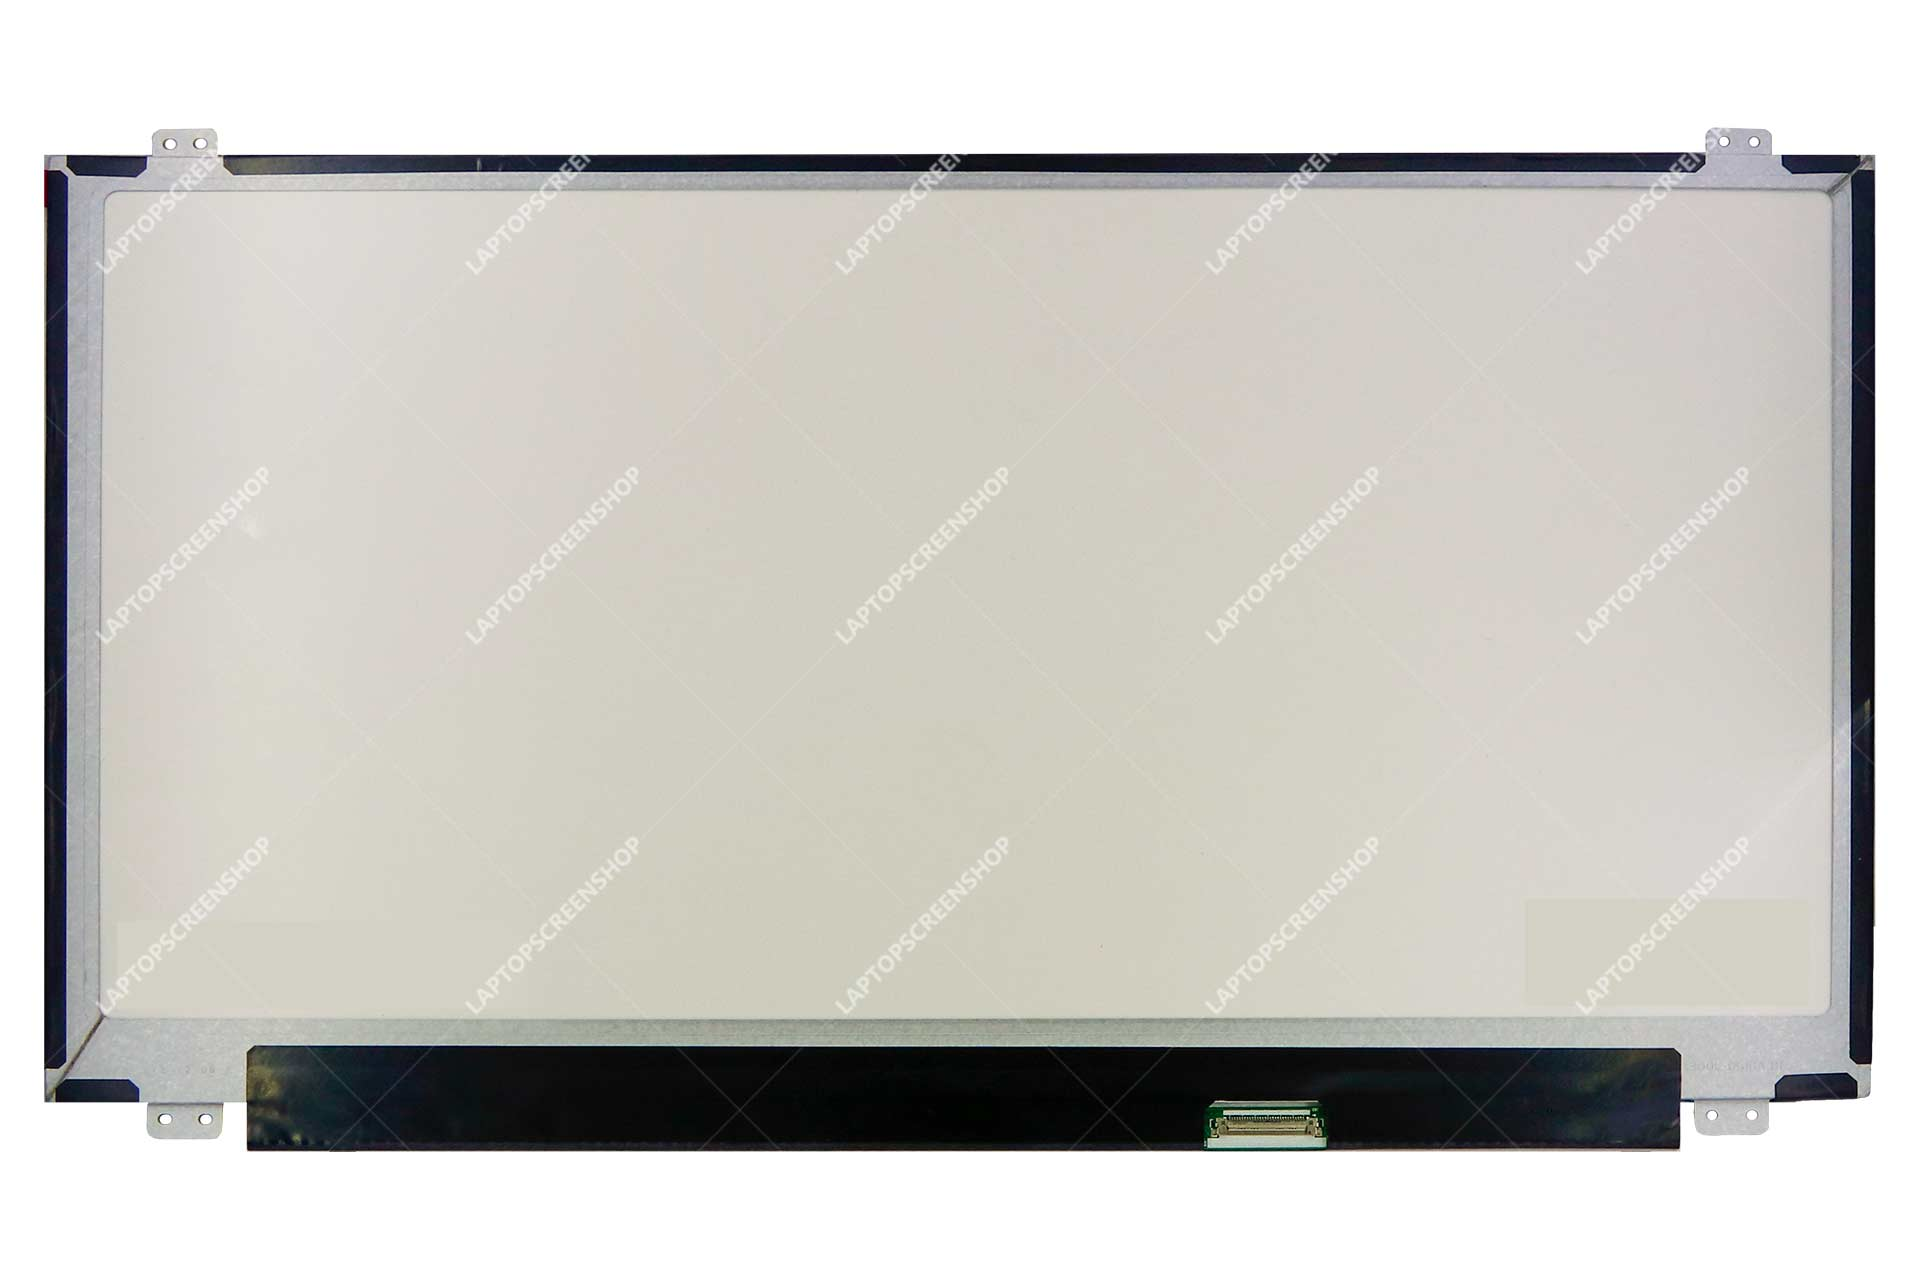 ACER-ASPIRE-E1-510-2821-LCD |HD|فروشگاه لپ تاپ اسکرين | تعمير لپ تاپ